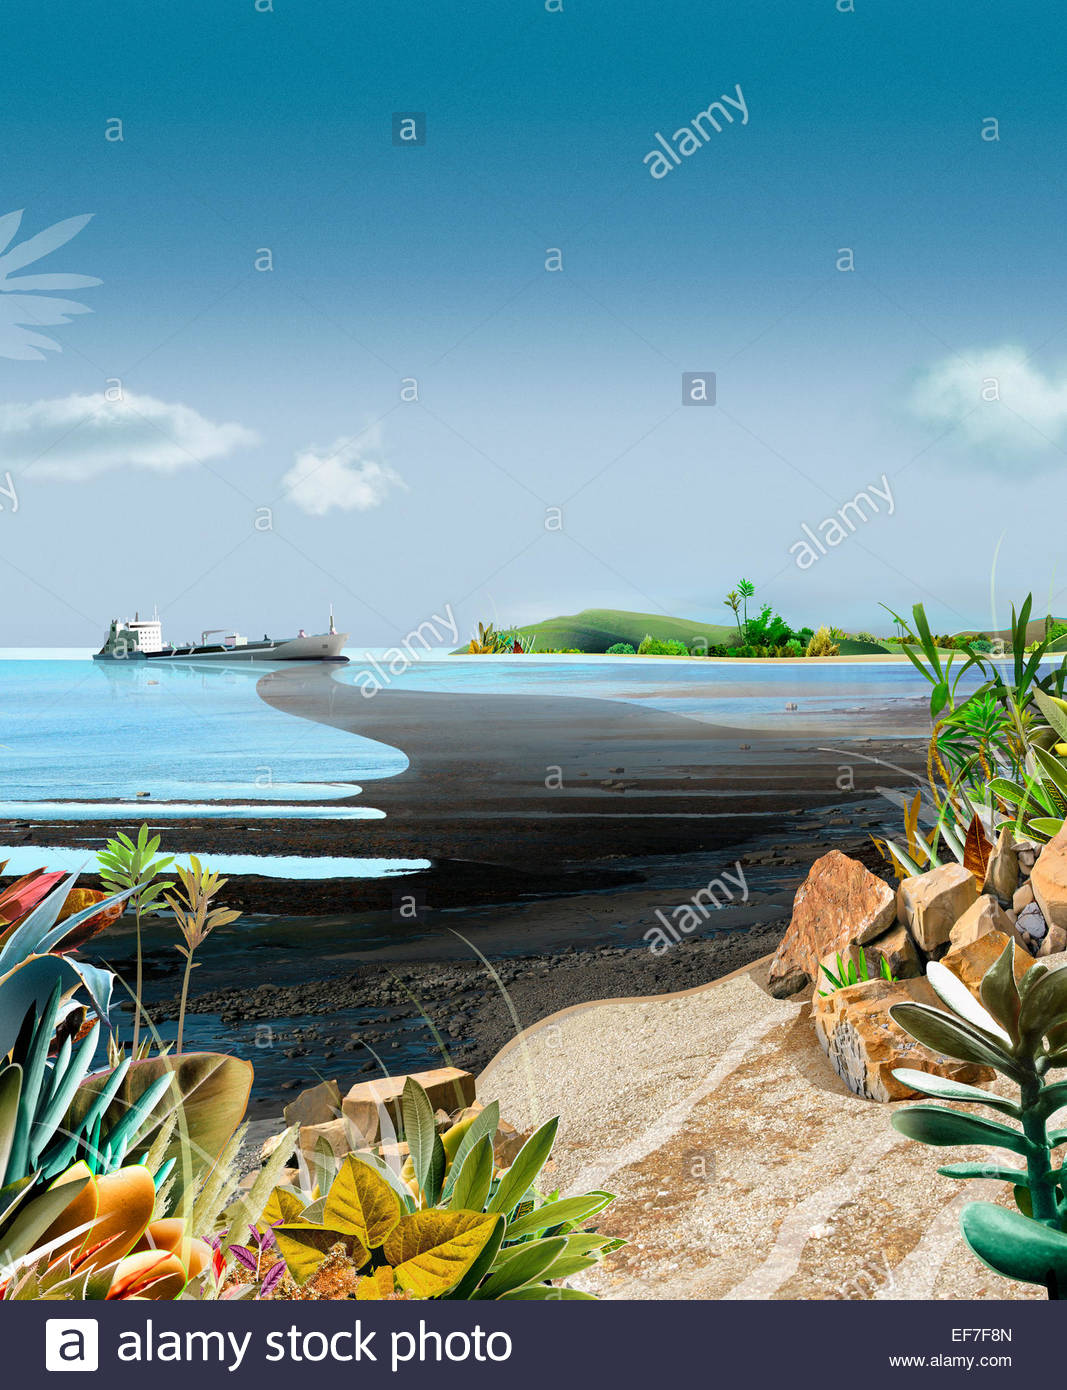 Oil slick spilling onto beach from sinking ship - Stock Image